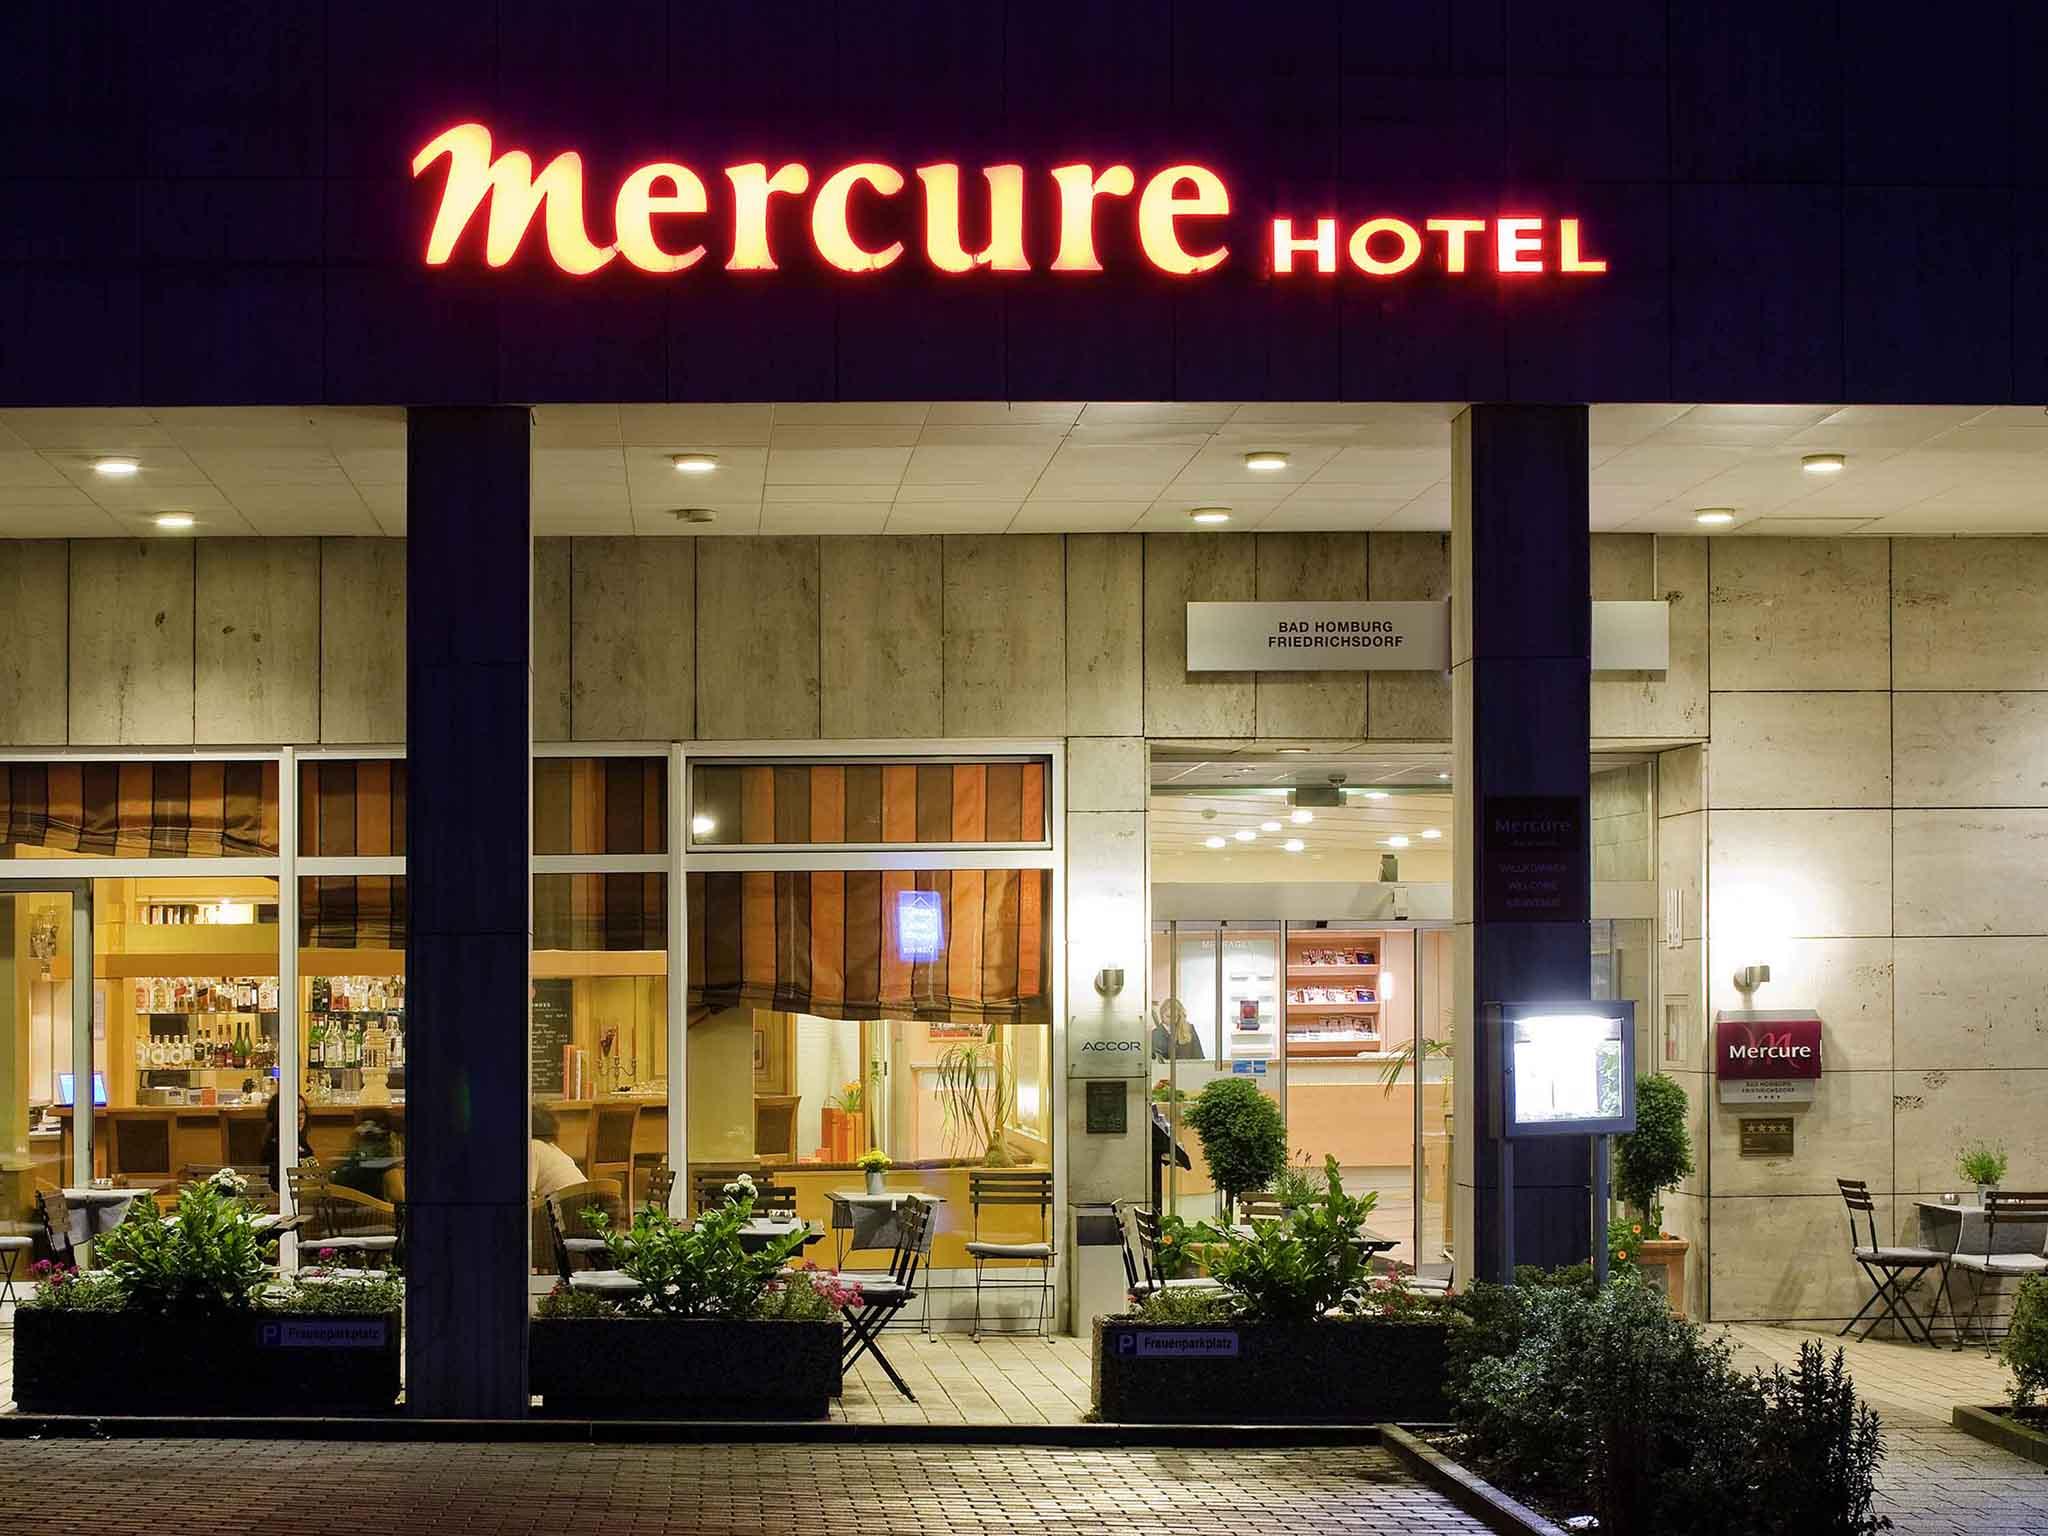 Hotel - Mercure Hotel Bad Homburg Friedrichsdorf